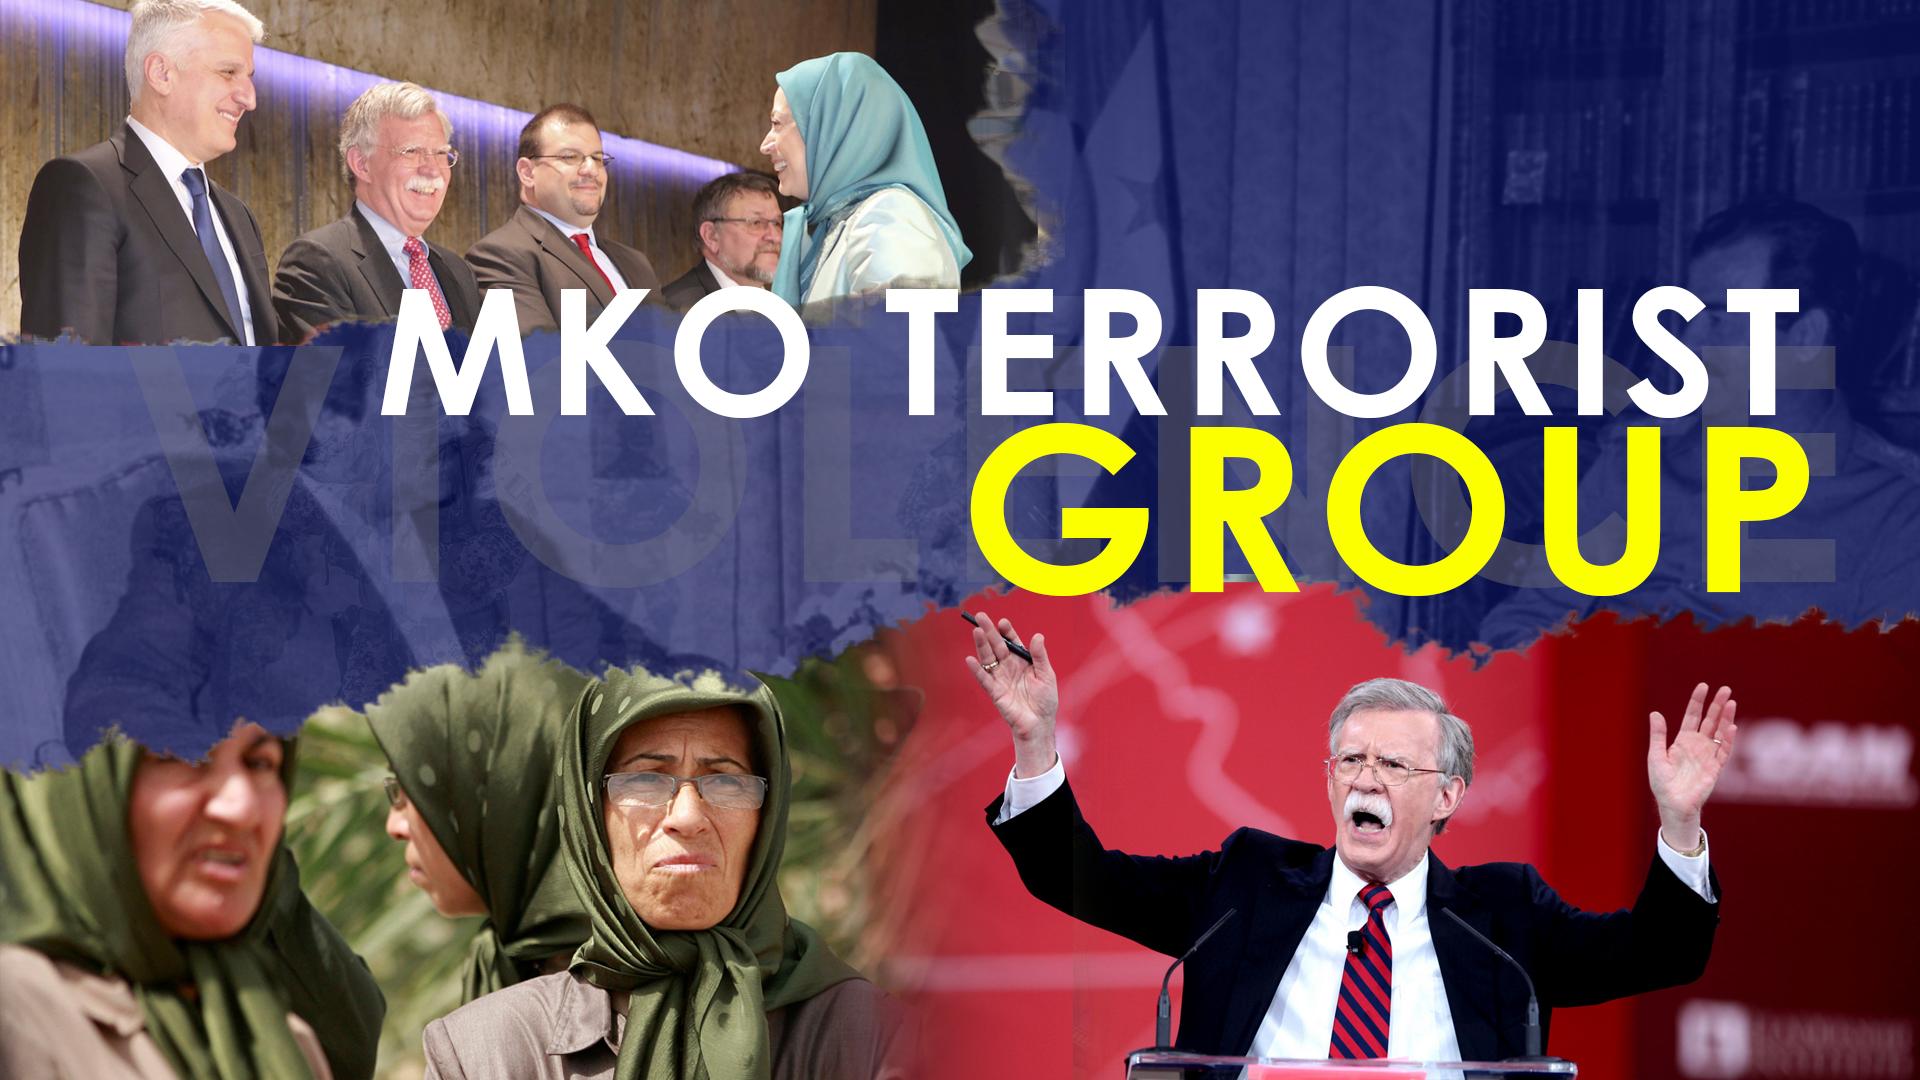 MKO terrorist group